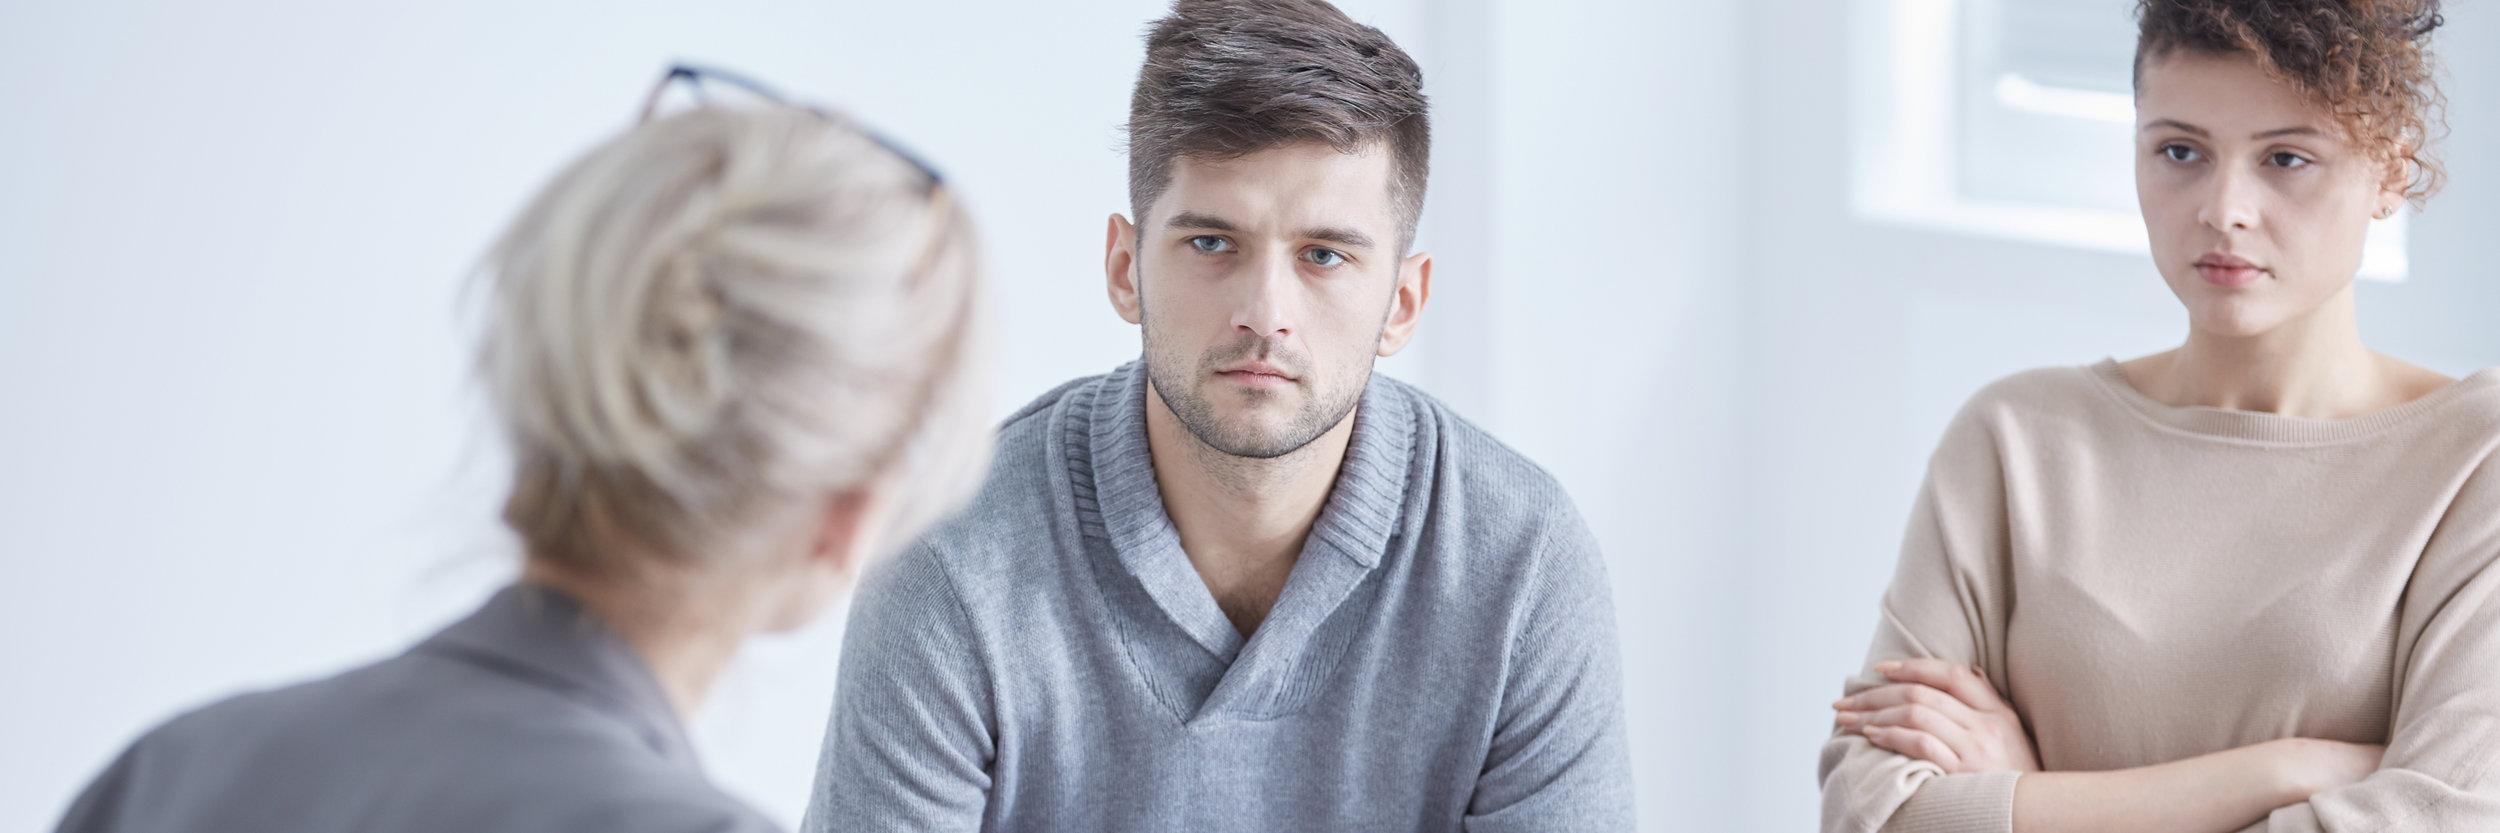 relationship-psychologist-mediating-young-PYQXTBQ.jpg